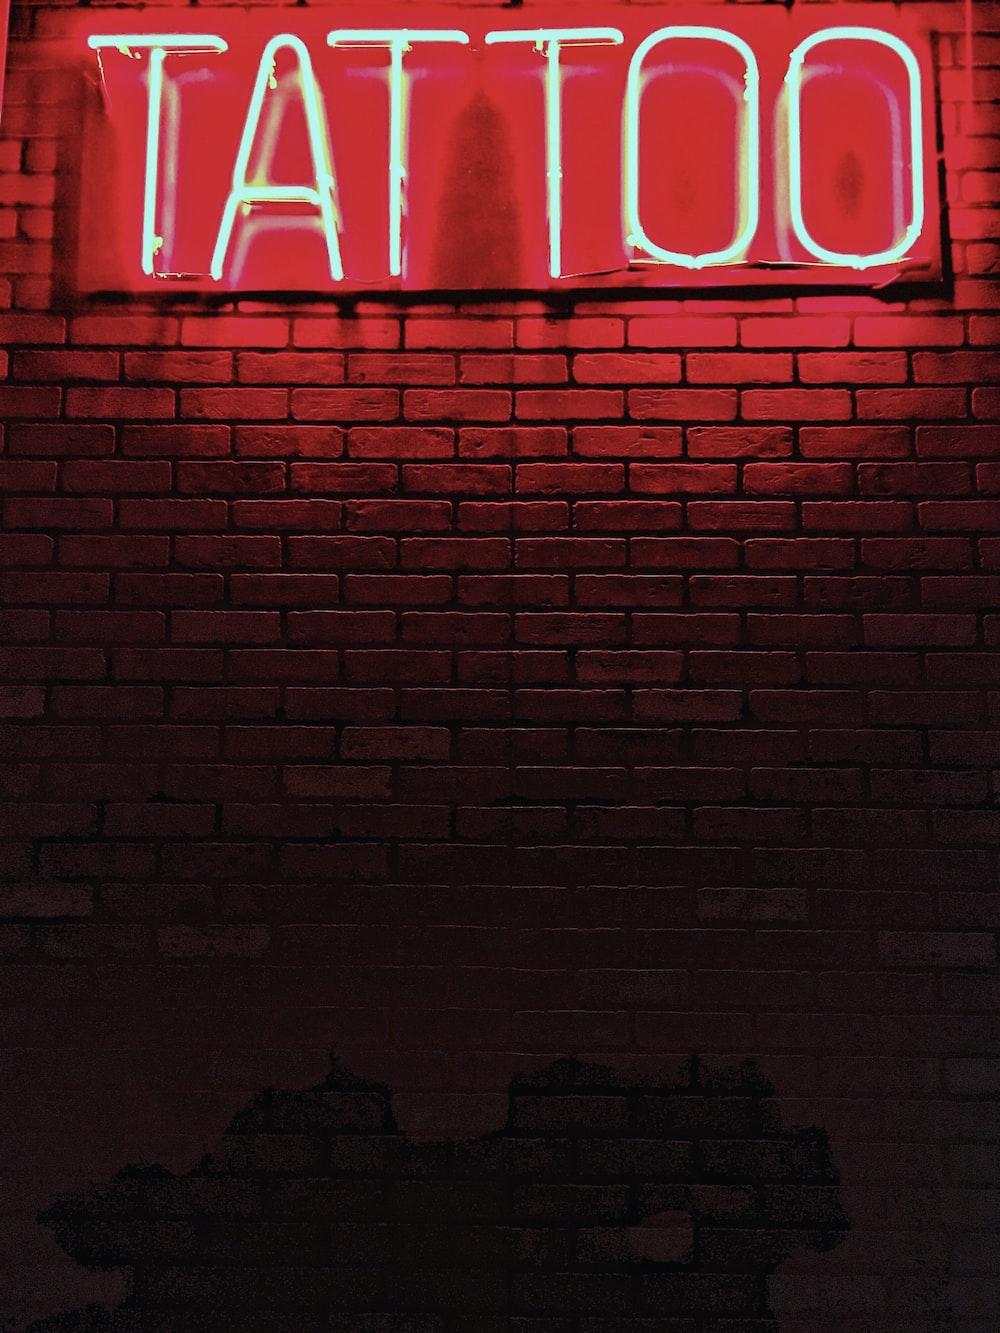 red Tattoo neon light signage